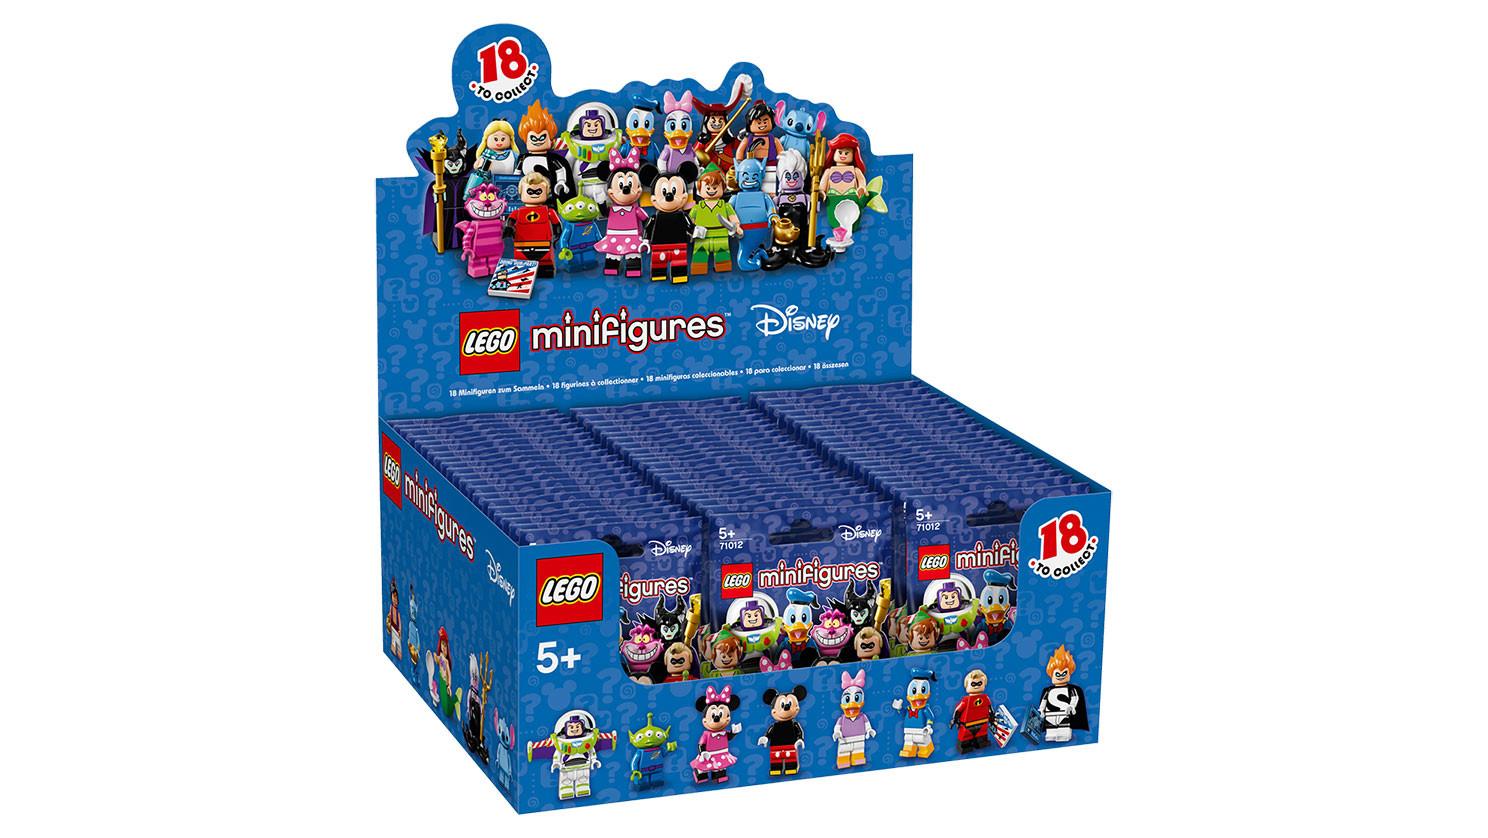 Lego Maleficent Minifigure LEGO 71012 Minifigurka...